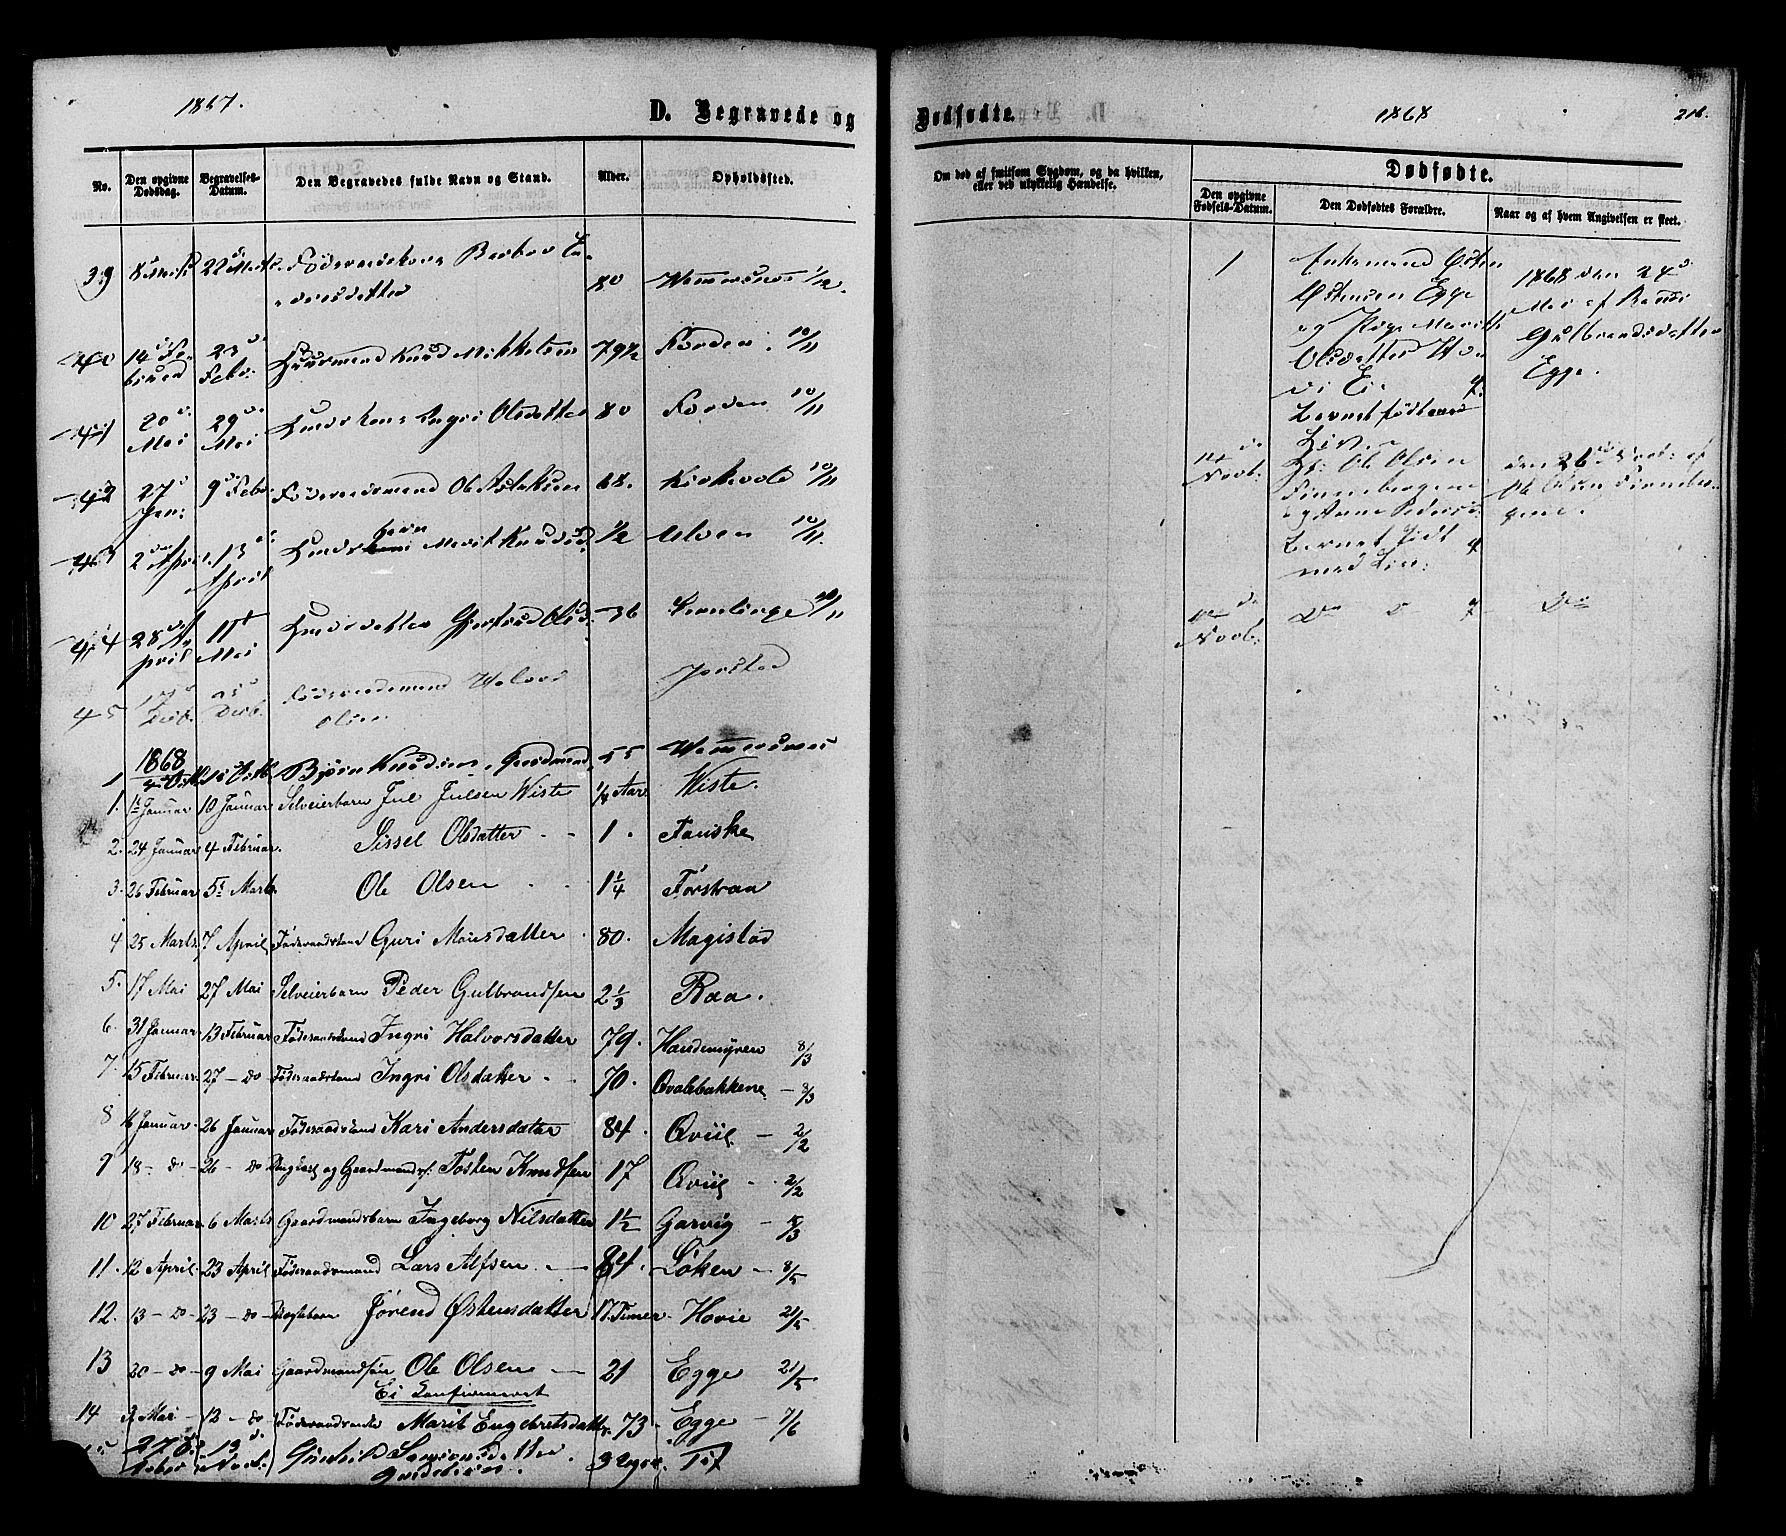 SAH, Vestre Slidre prestekontor, Ministerialbok nr. 3, 1865-1880, s. 216